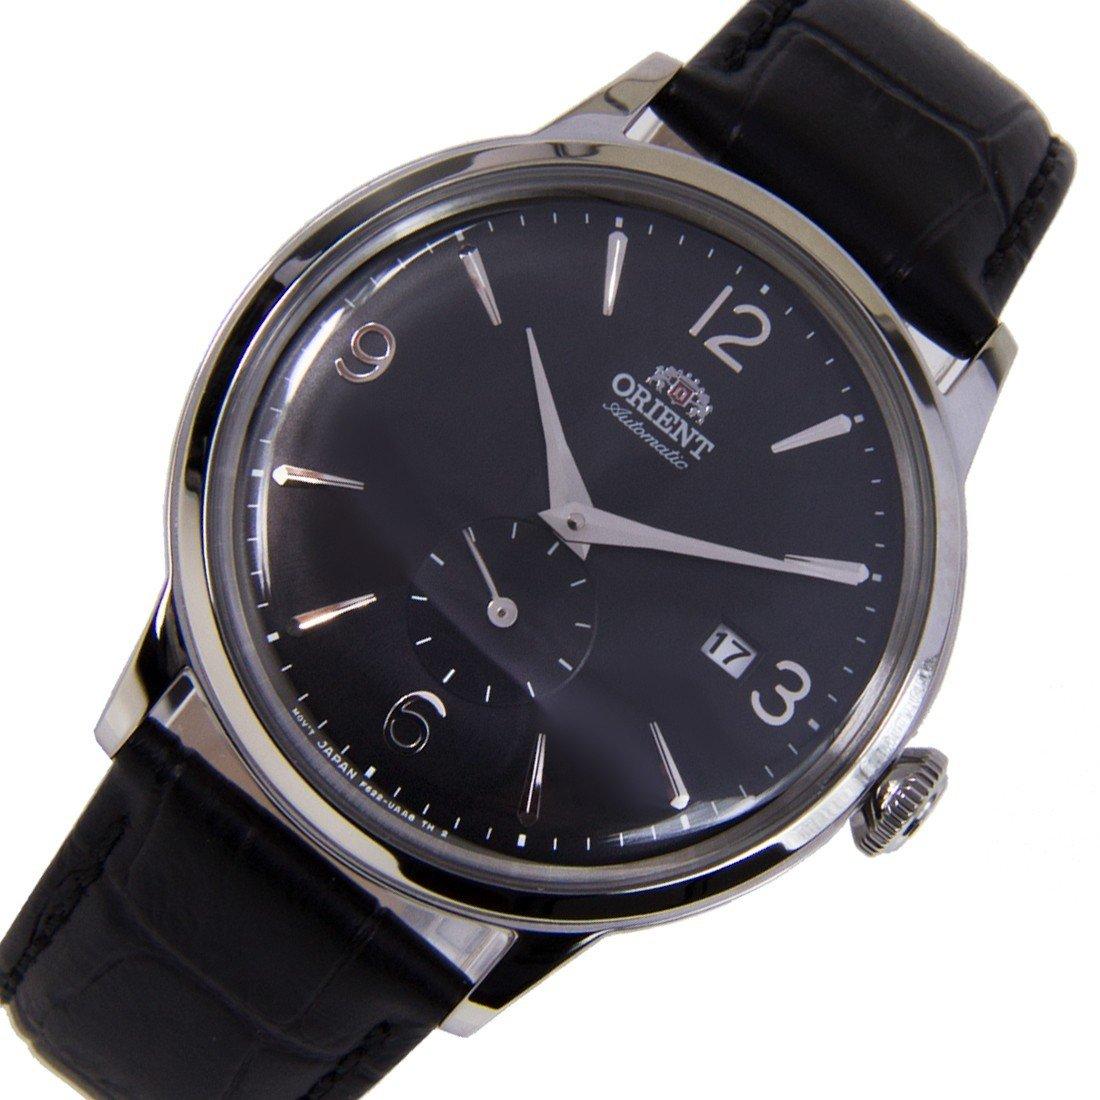 reloj automático hombre Orient Bambino RA-AP0005B negro correa cuero